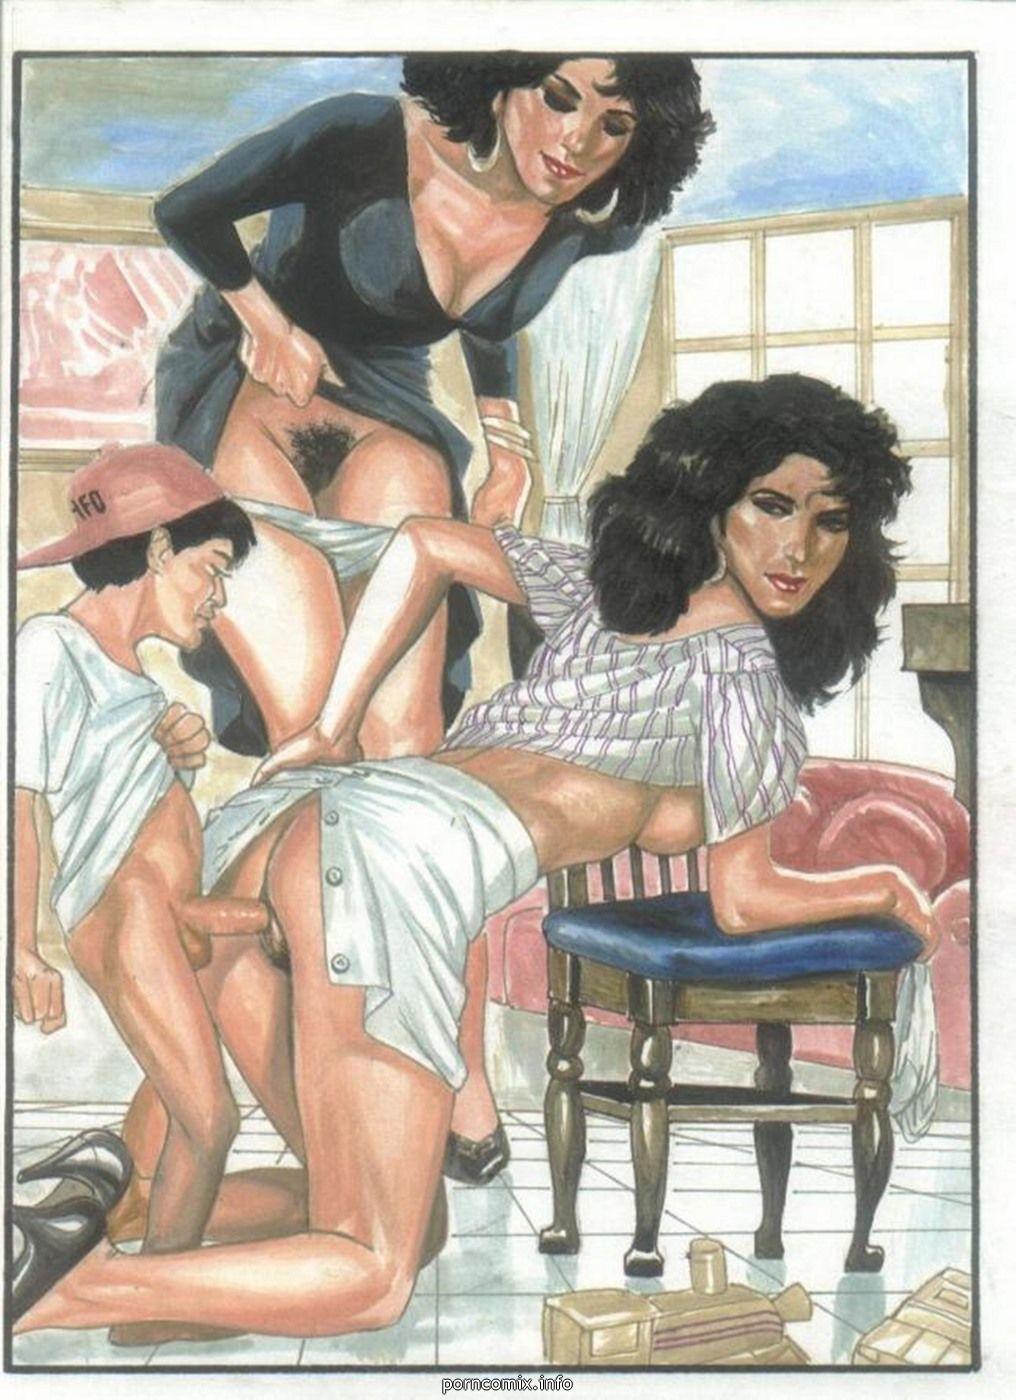 risovannie-porno-kartinki-ubb-classic